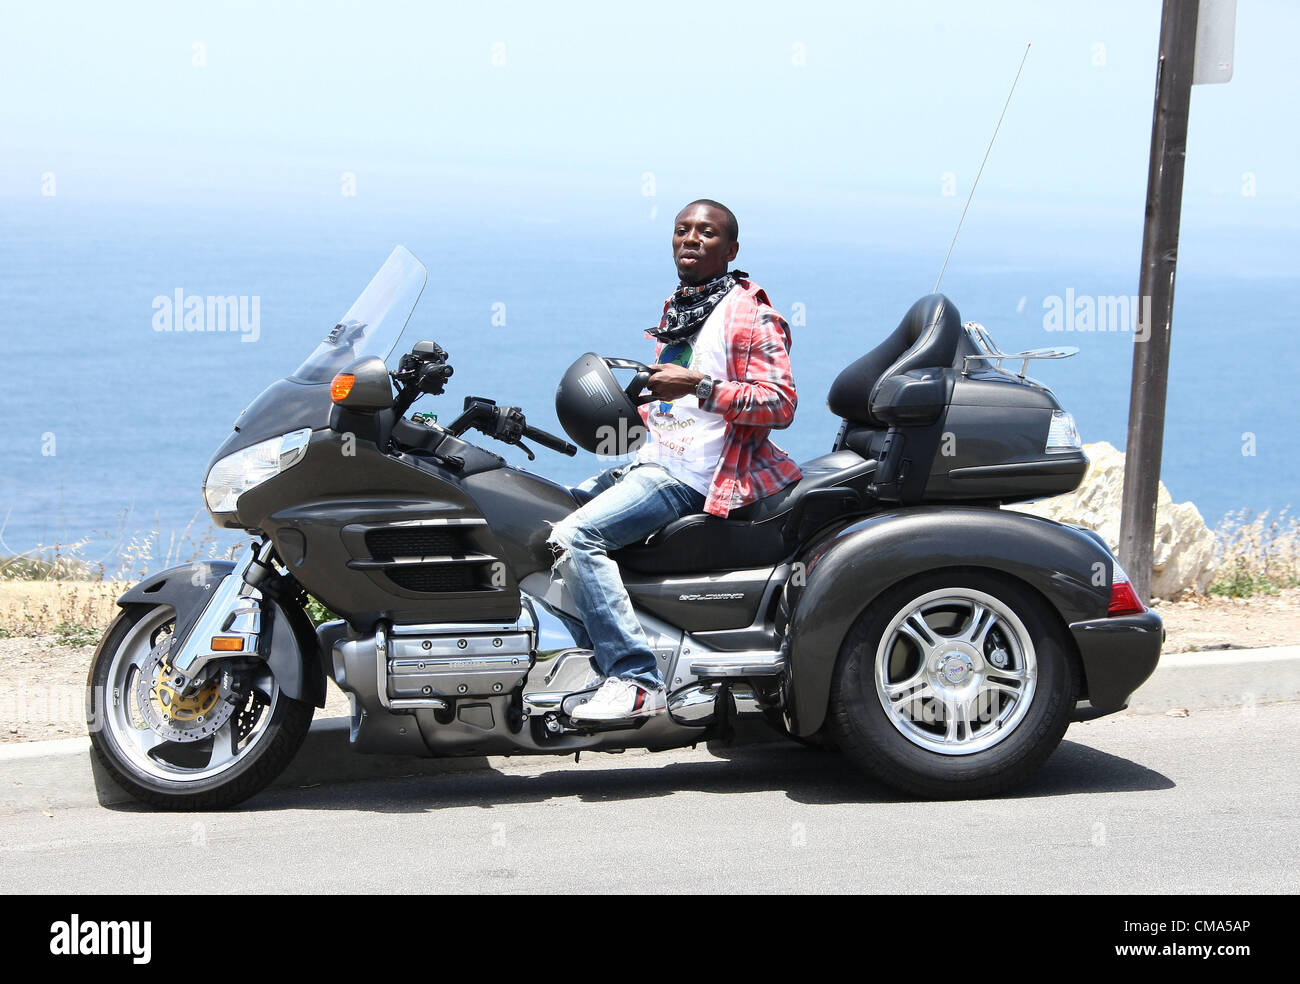 Shaun Wright-Phillips riding on a Harley Davidson - Stock Image